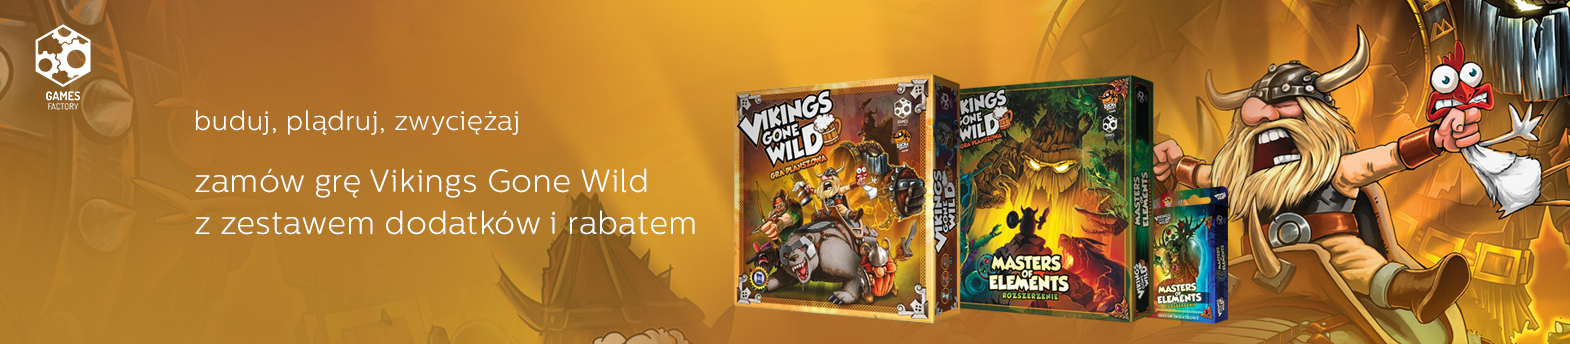 Vikings Gone Wild druga edycja w promocji